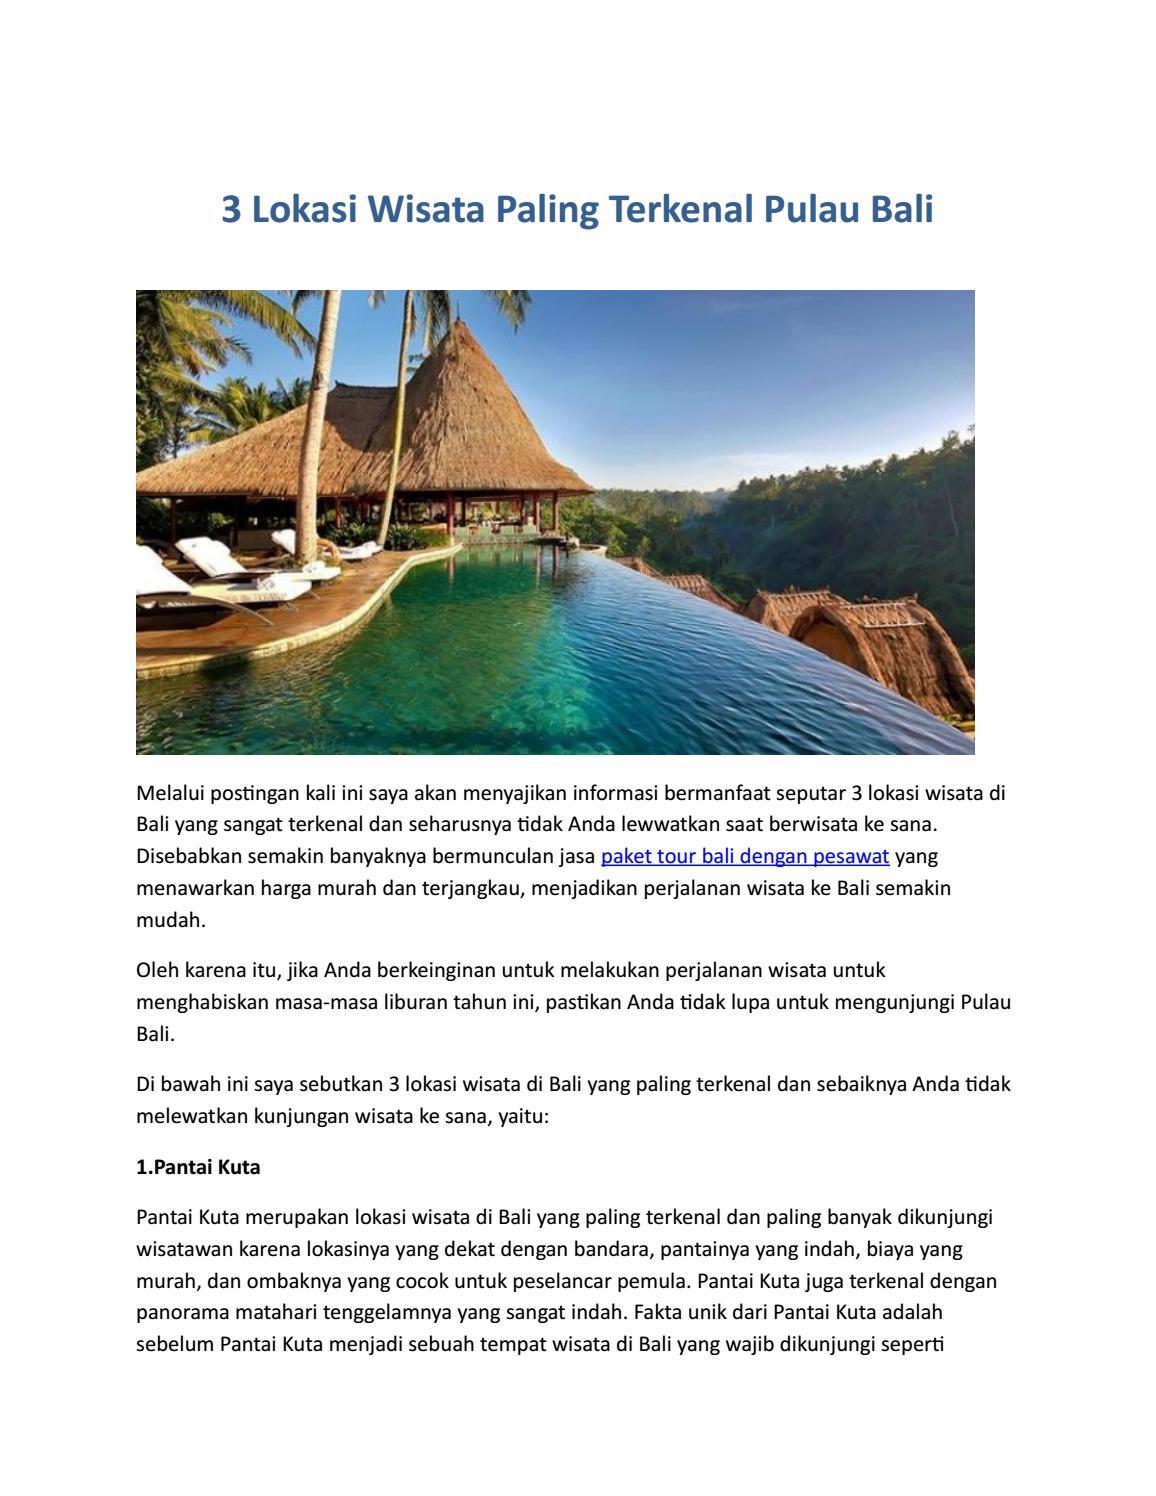 3 Lokasi Wisata Paling Terkenal Pulau Bali By Muhammad